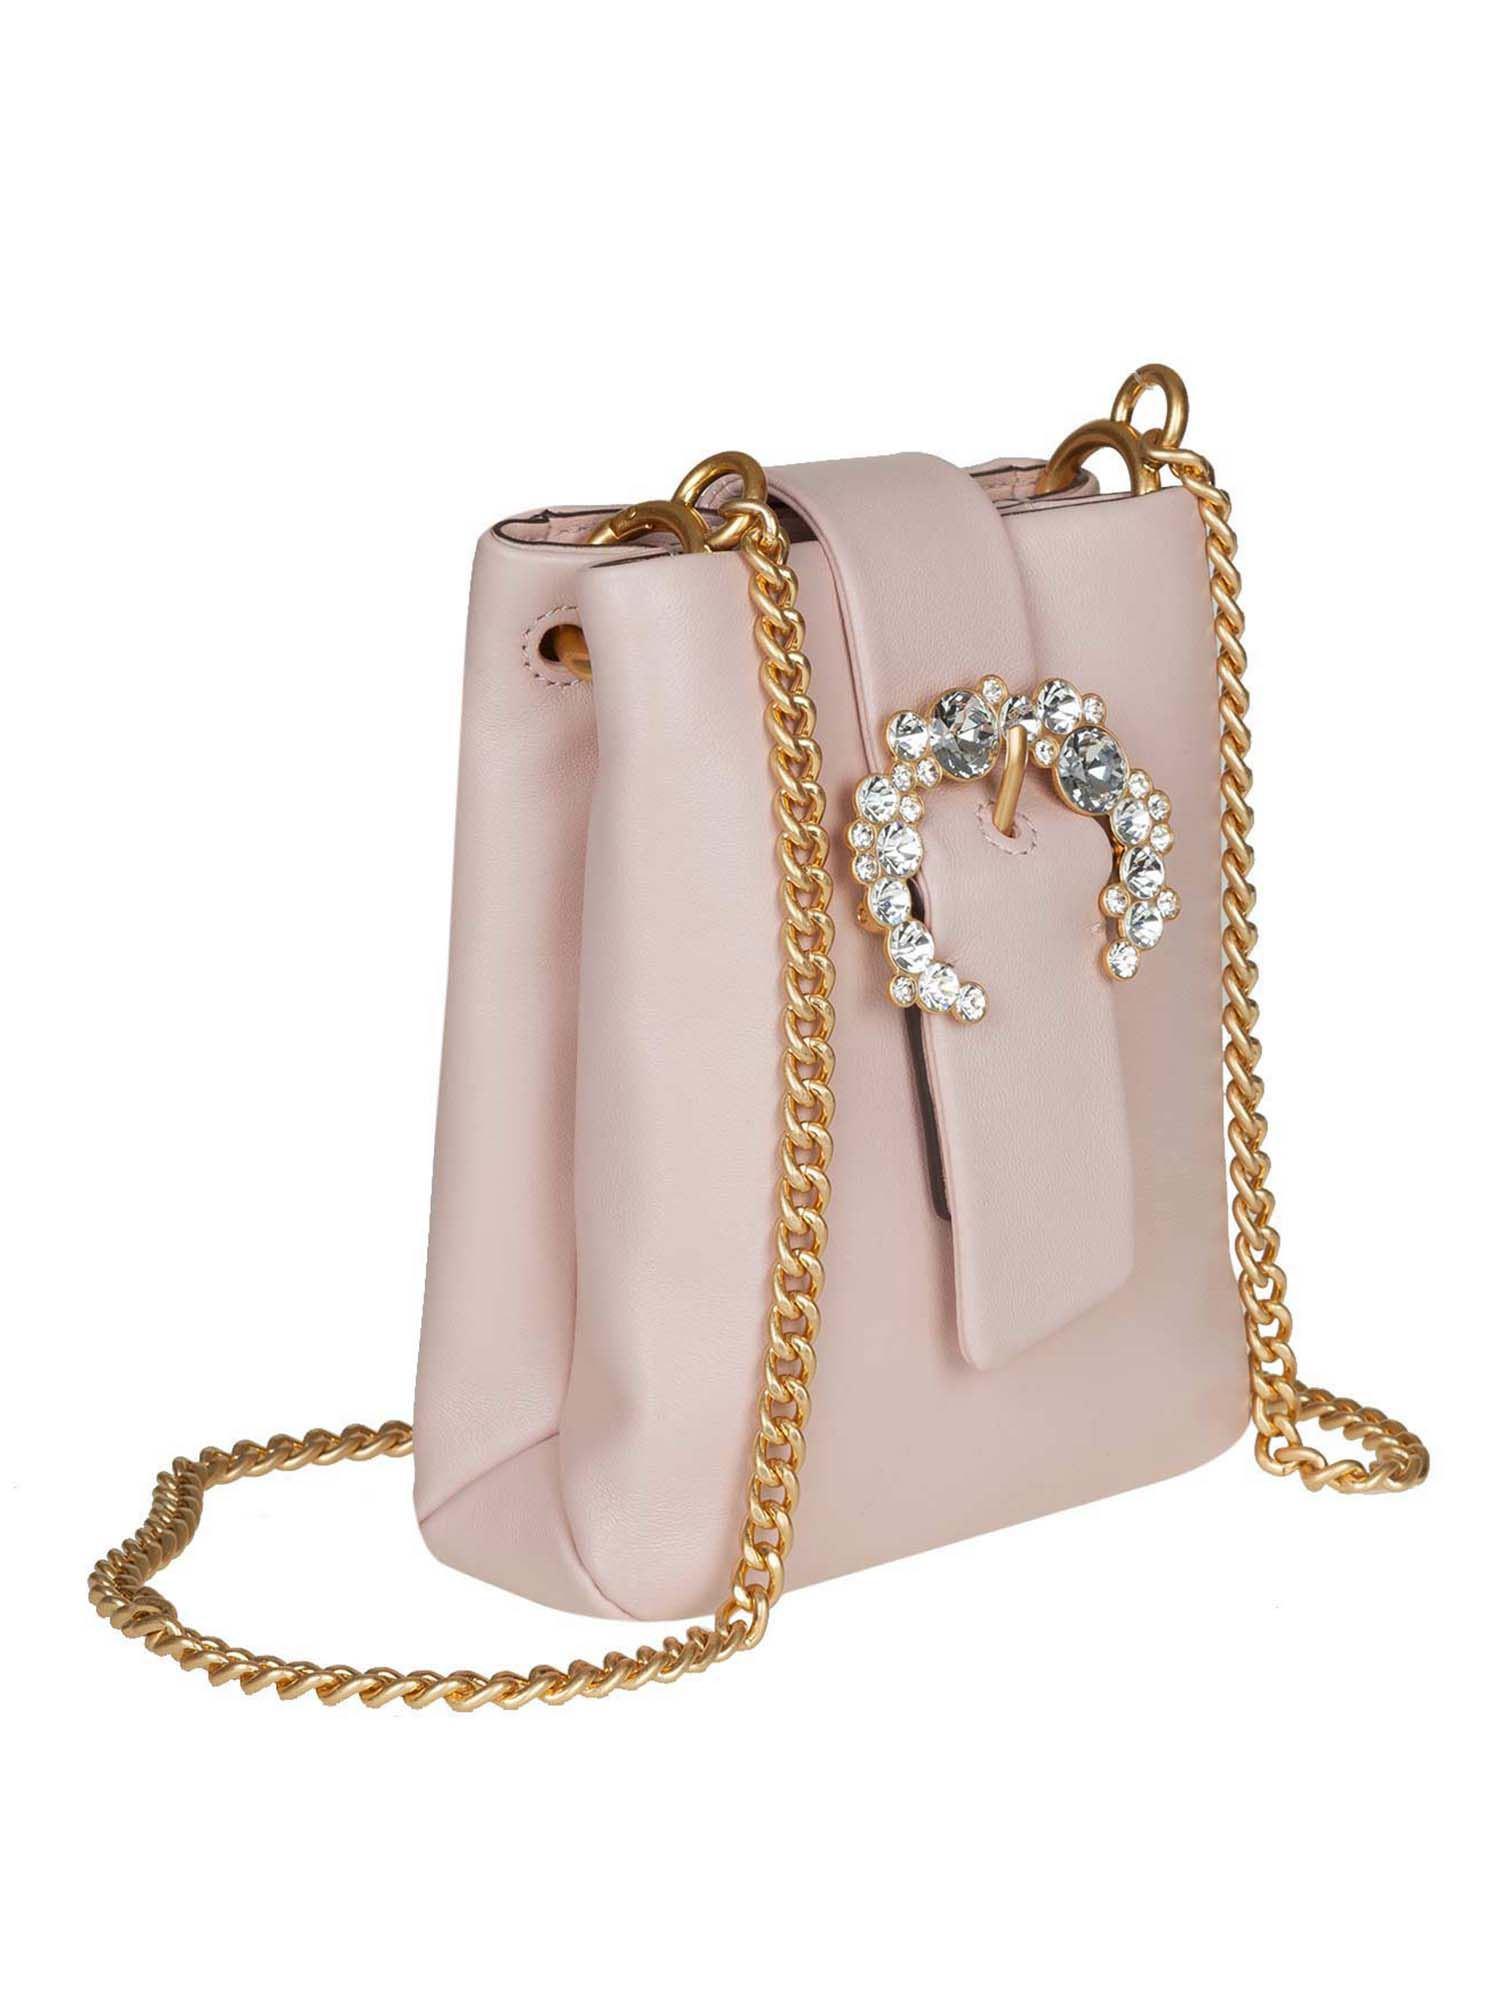 dc1398b5316a Tory Burch Handbag Women in Pink - Save 6% - Lyst